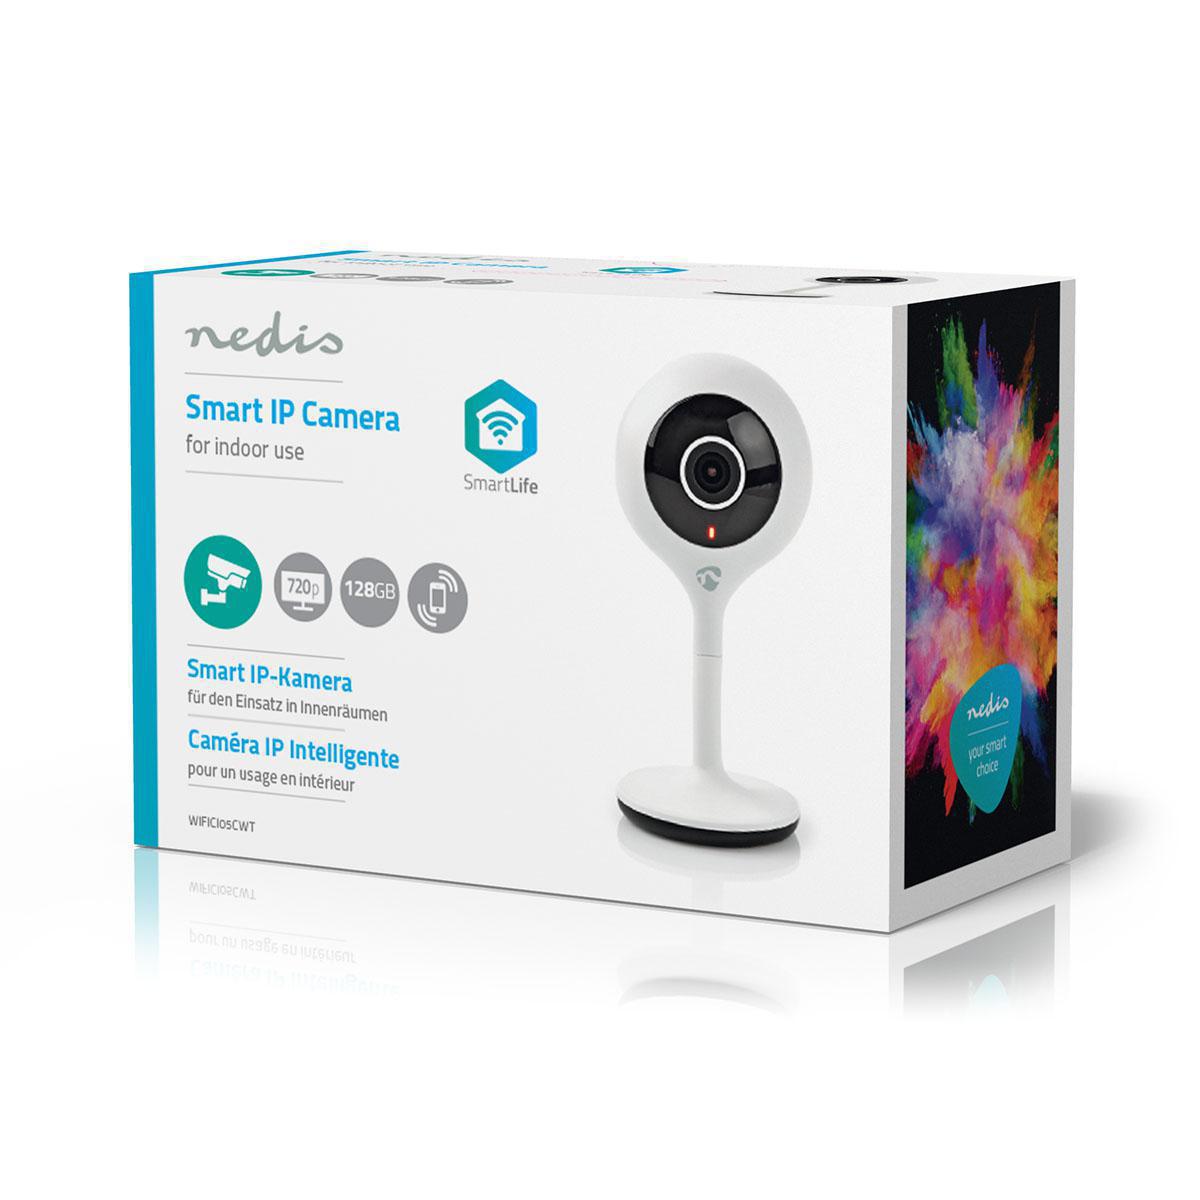 WiFi Smart IP Camera | HD 720p | Nedis